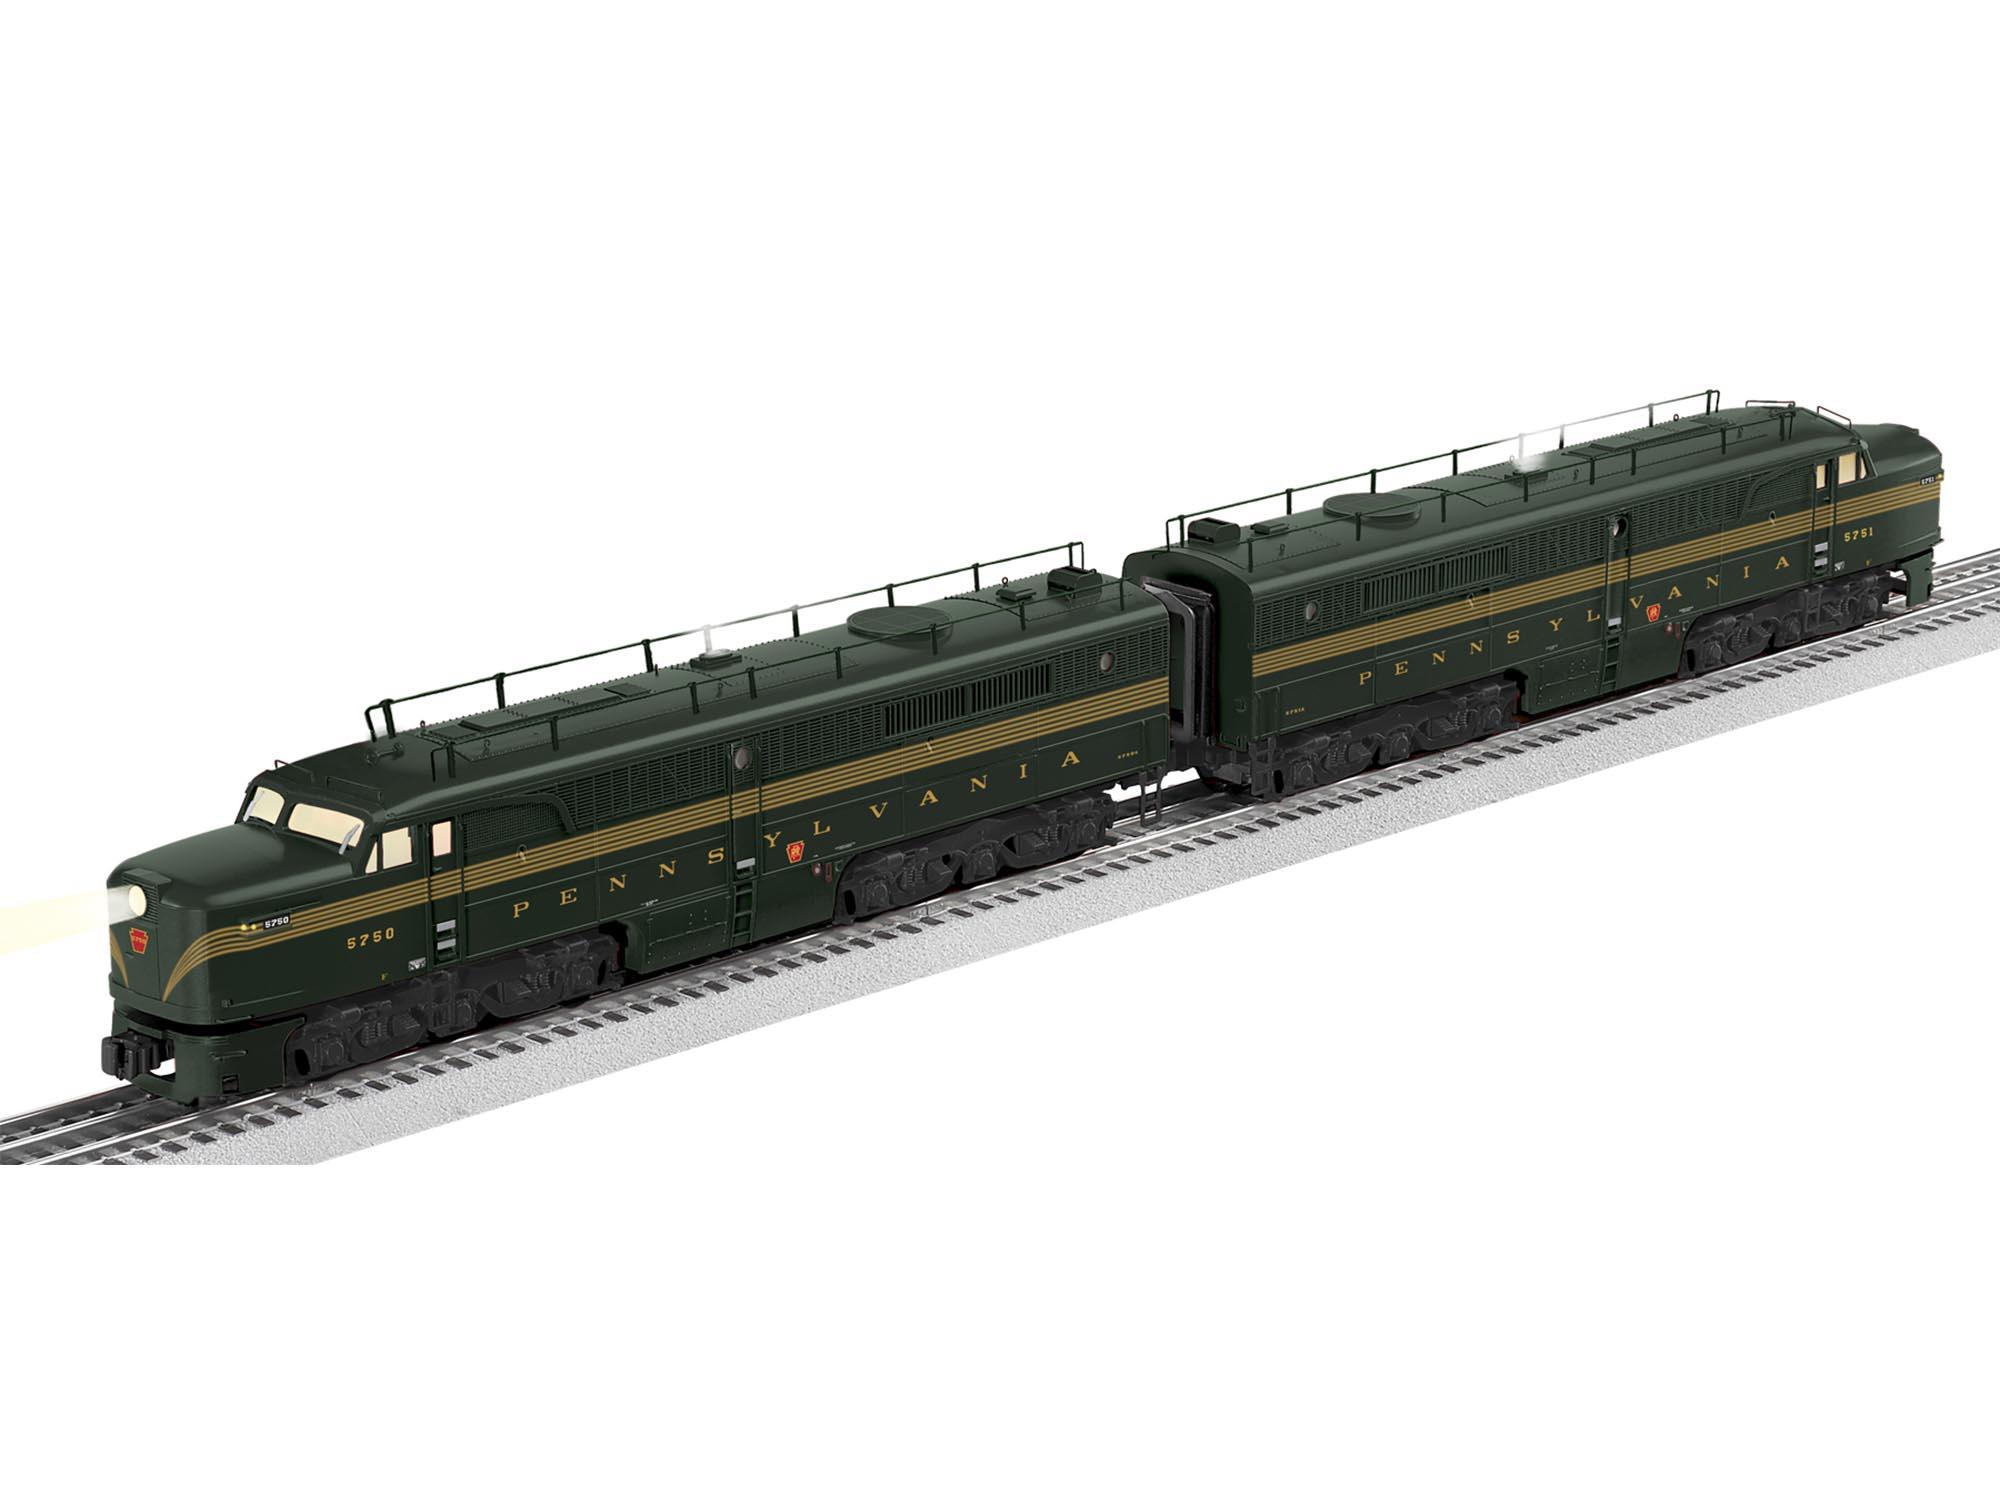 LIONEL TRAIN PARTS DIESEL ENGINE LOCOMOTIVE POWER TRUCK SET PAIR METAL O GAUGE